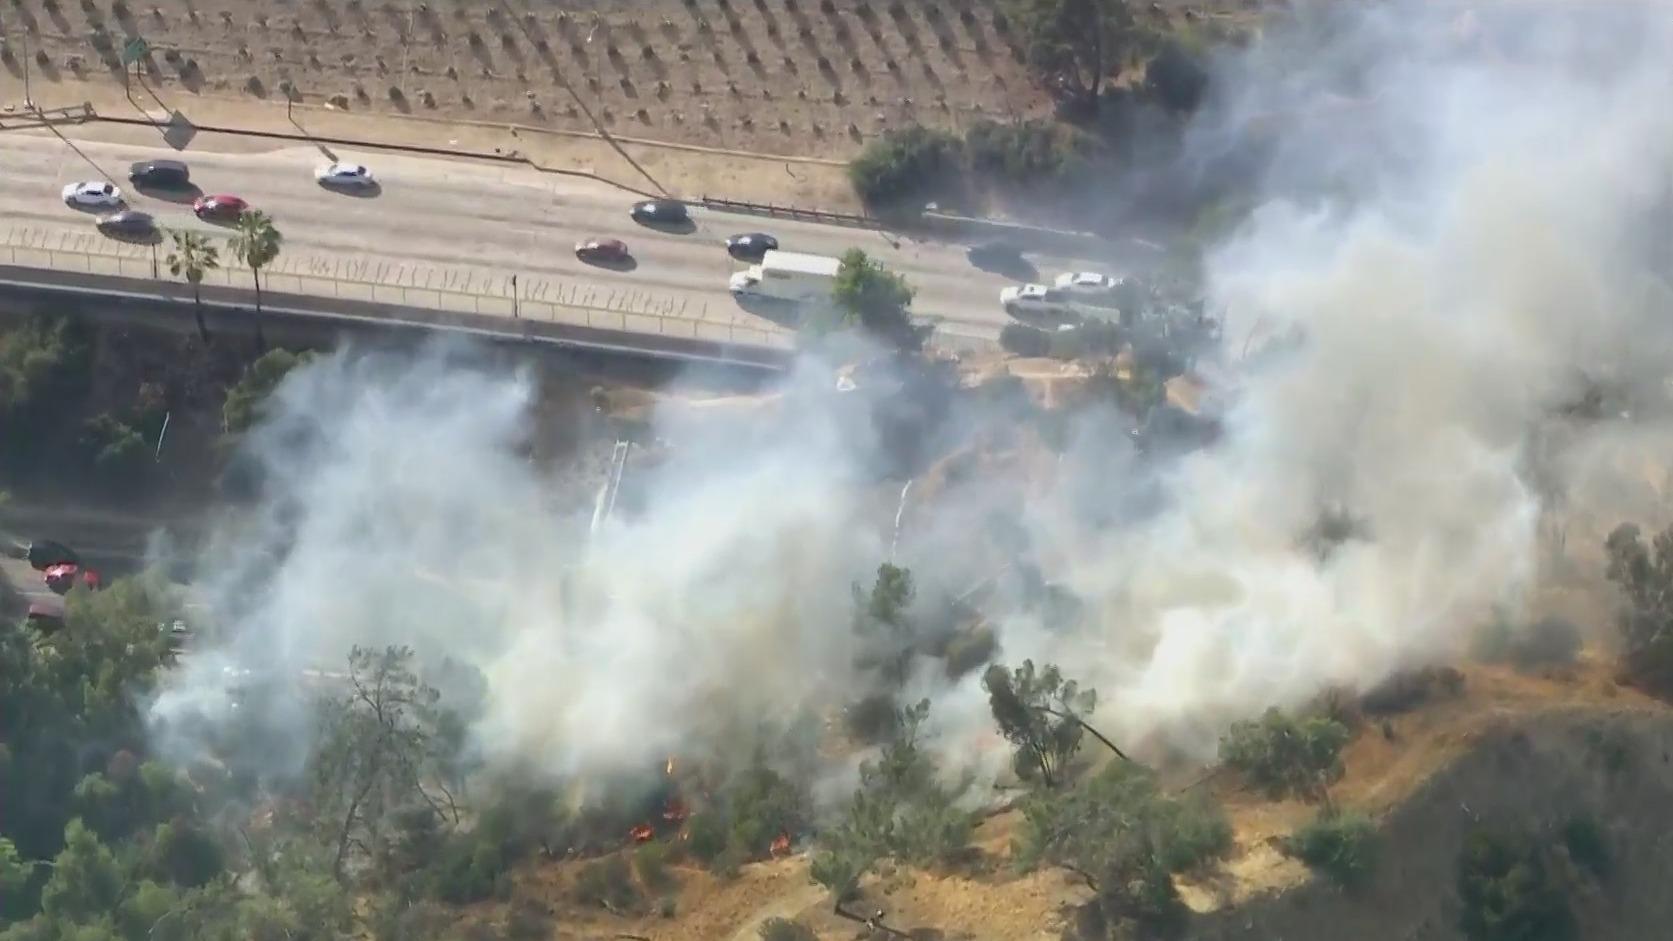 A brush fire burns along the 110 Freeway in Elysian Park on May 21, 2021. (KTLA)